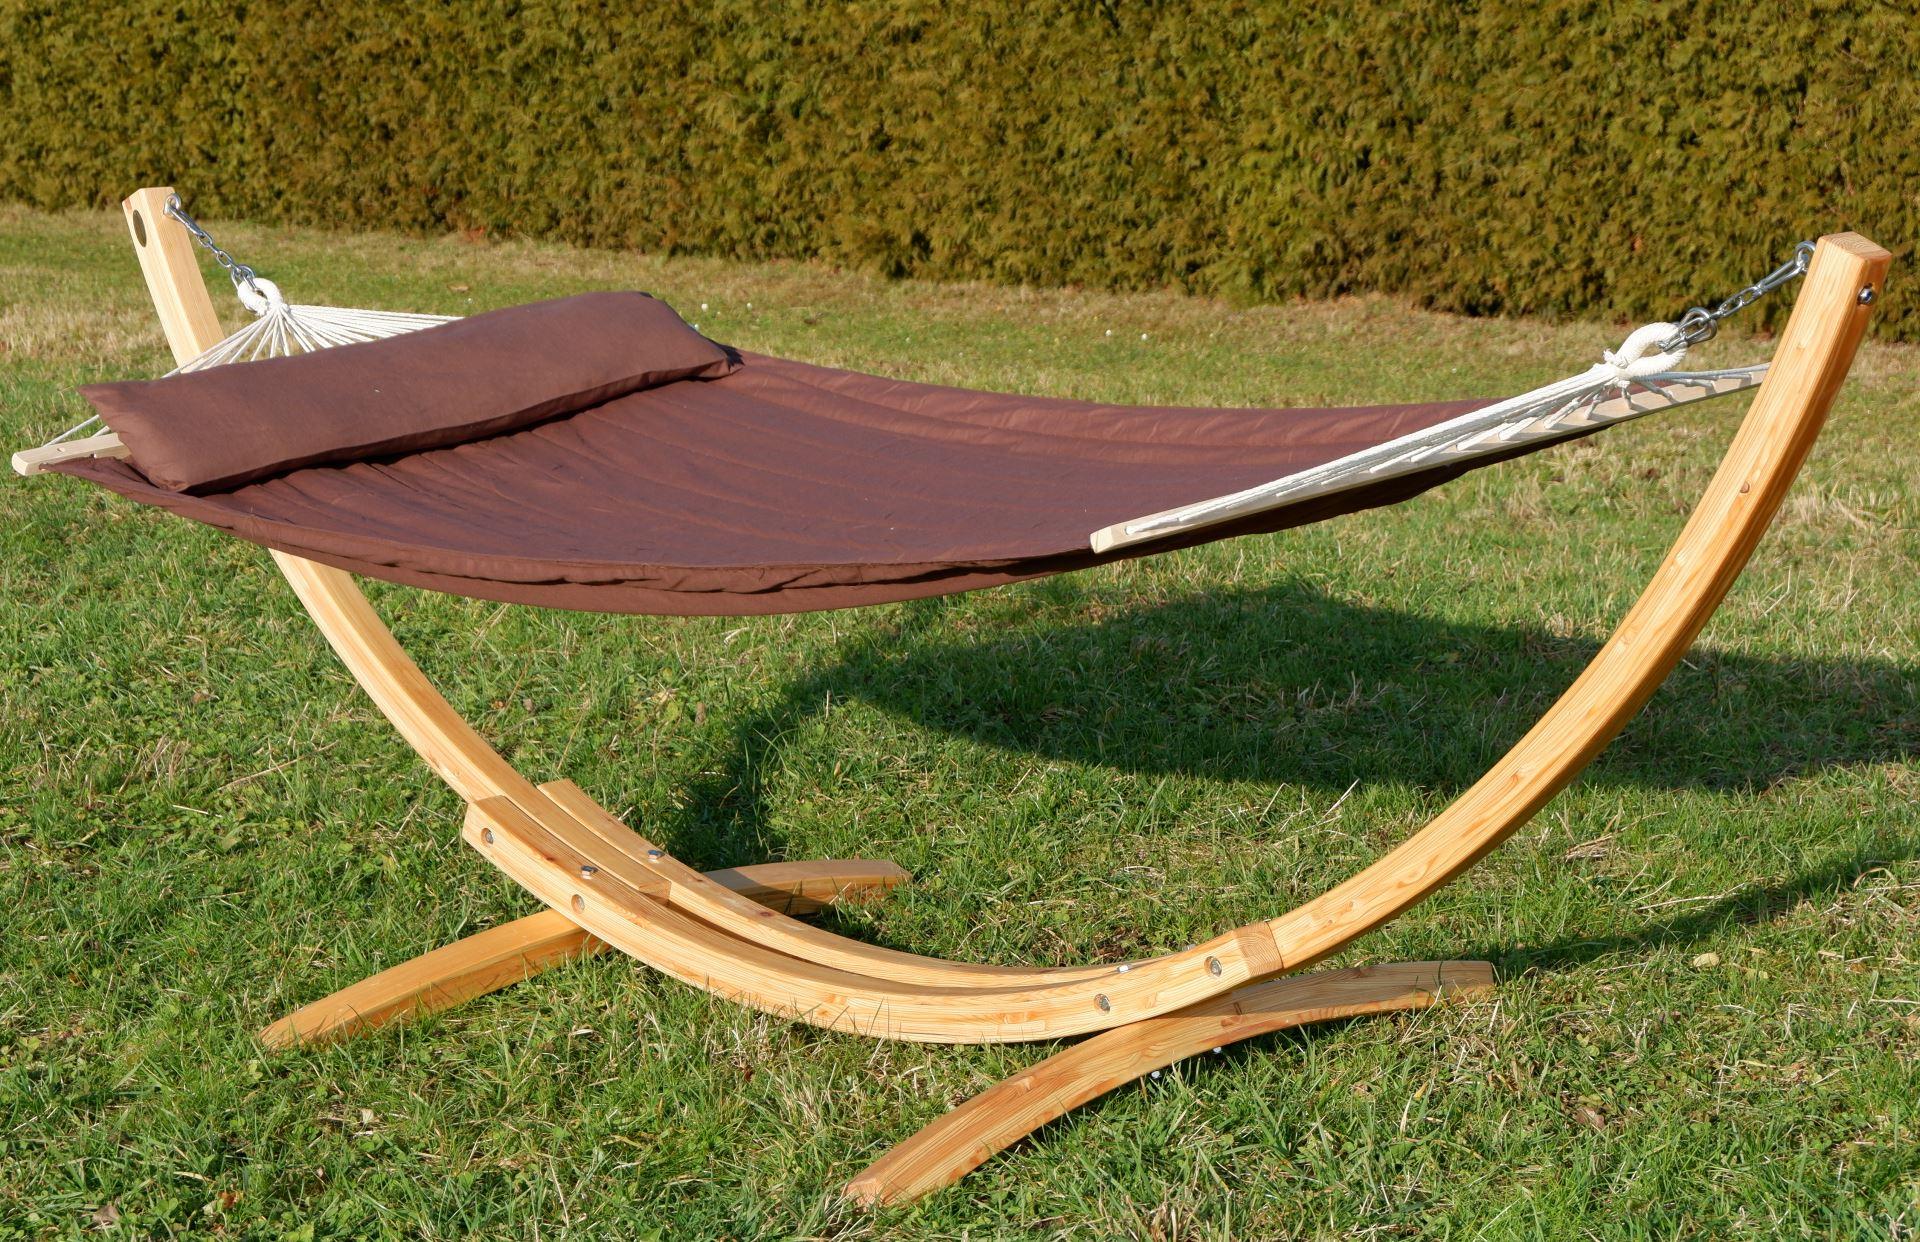 320cm h ngemattengestell xl limited edition aus holz l rche natur mit stab h ngematte braun. Black Bedroom Furniture Sets. Home Design Ideas